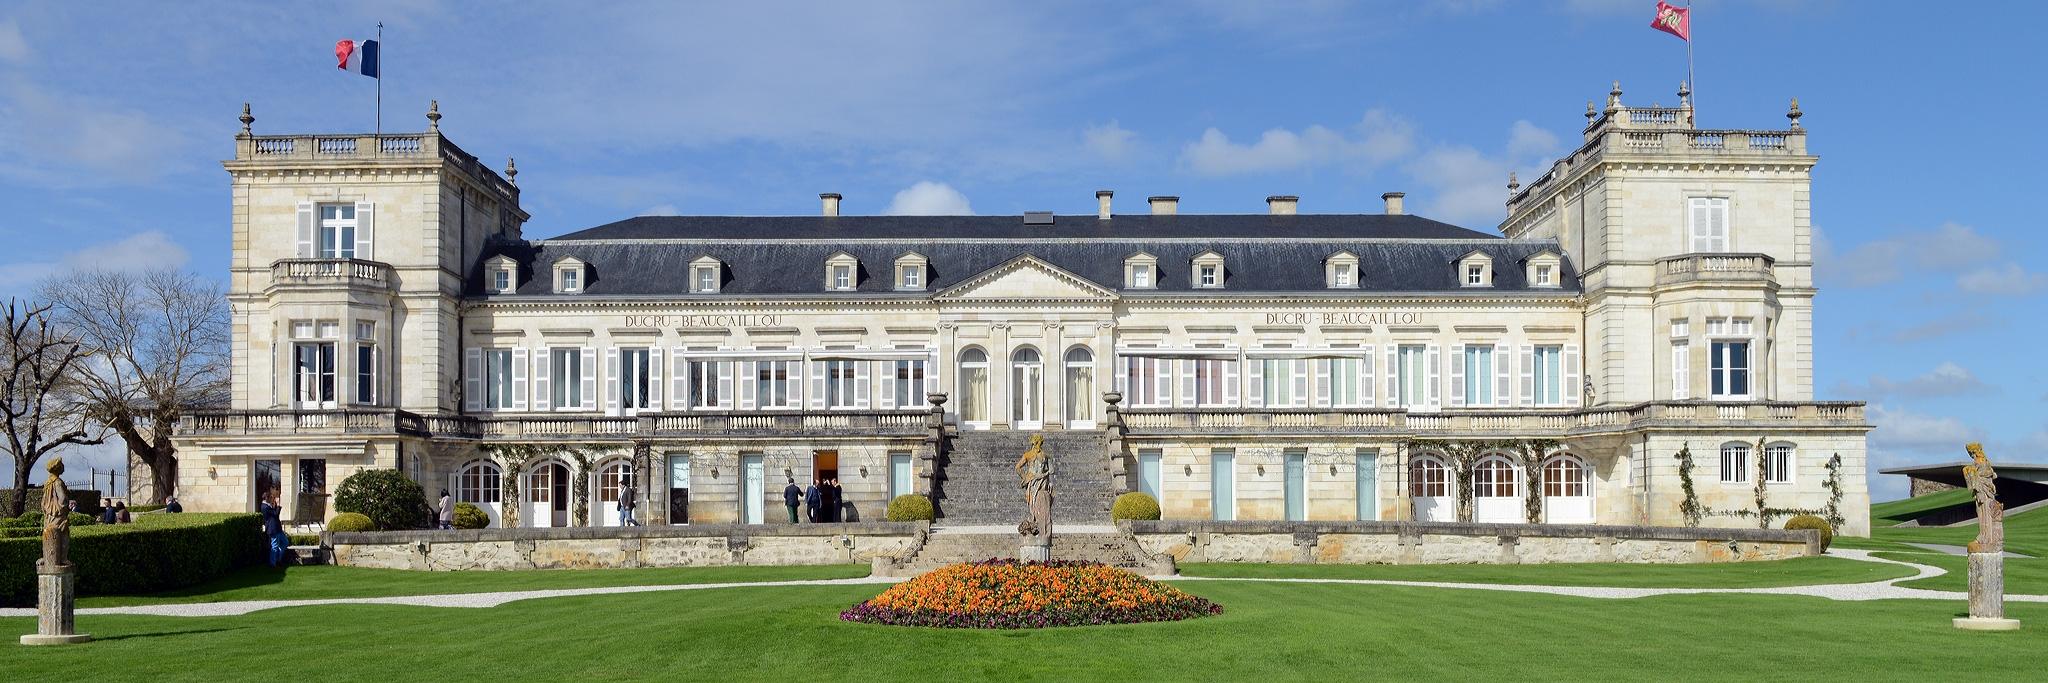 Château Ducru-Beaucaillou - AUX FINS GOURMETS